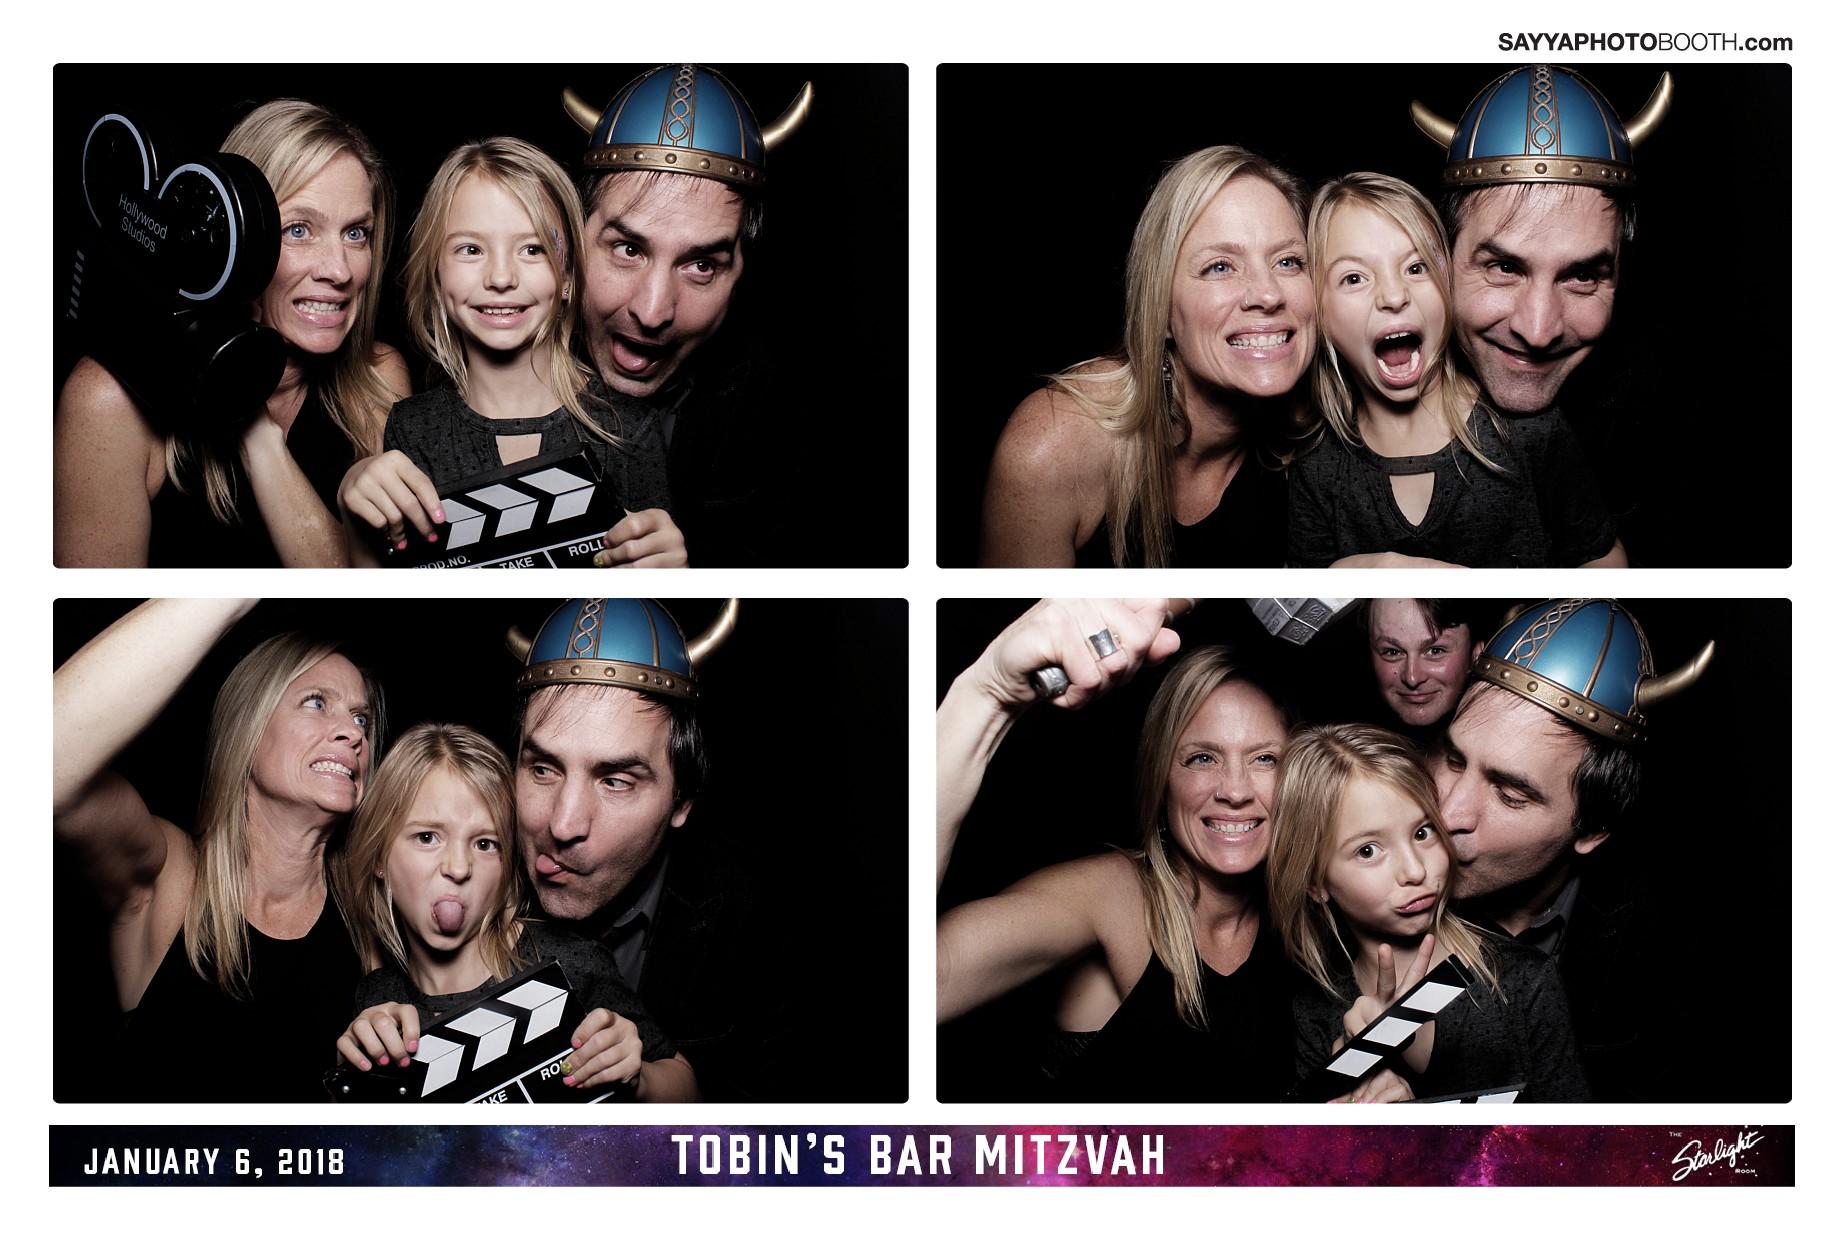 Tobin's Bar Mitzvah